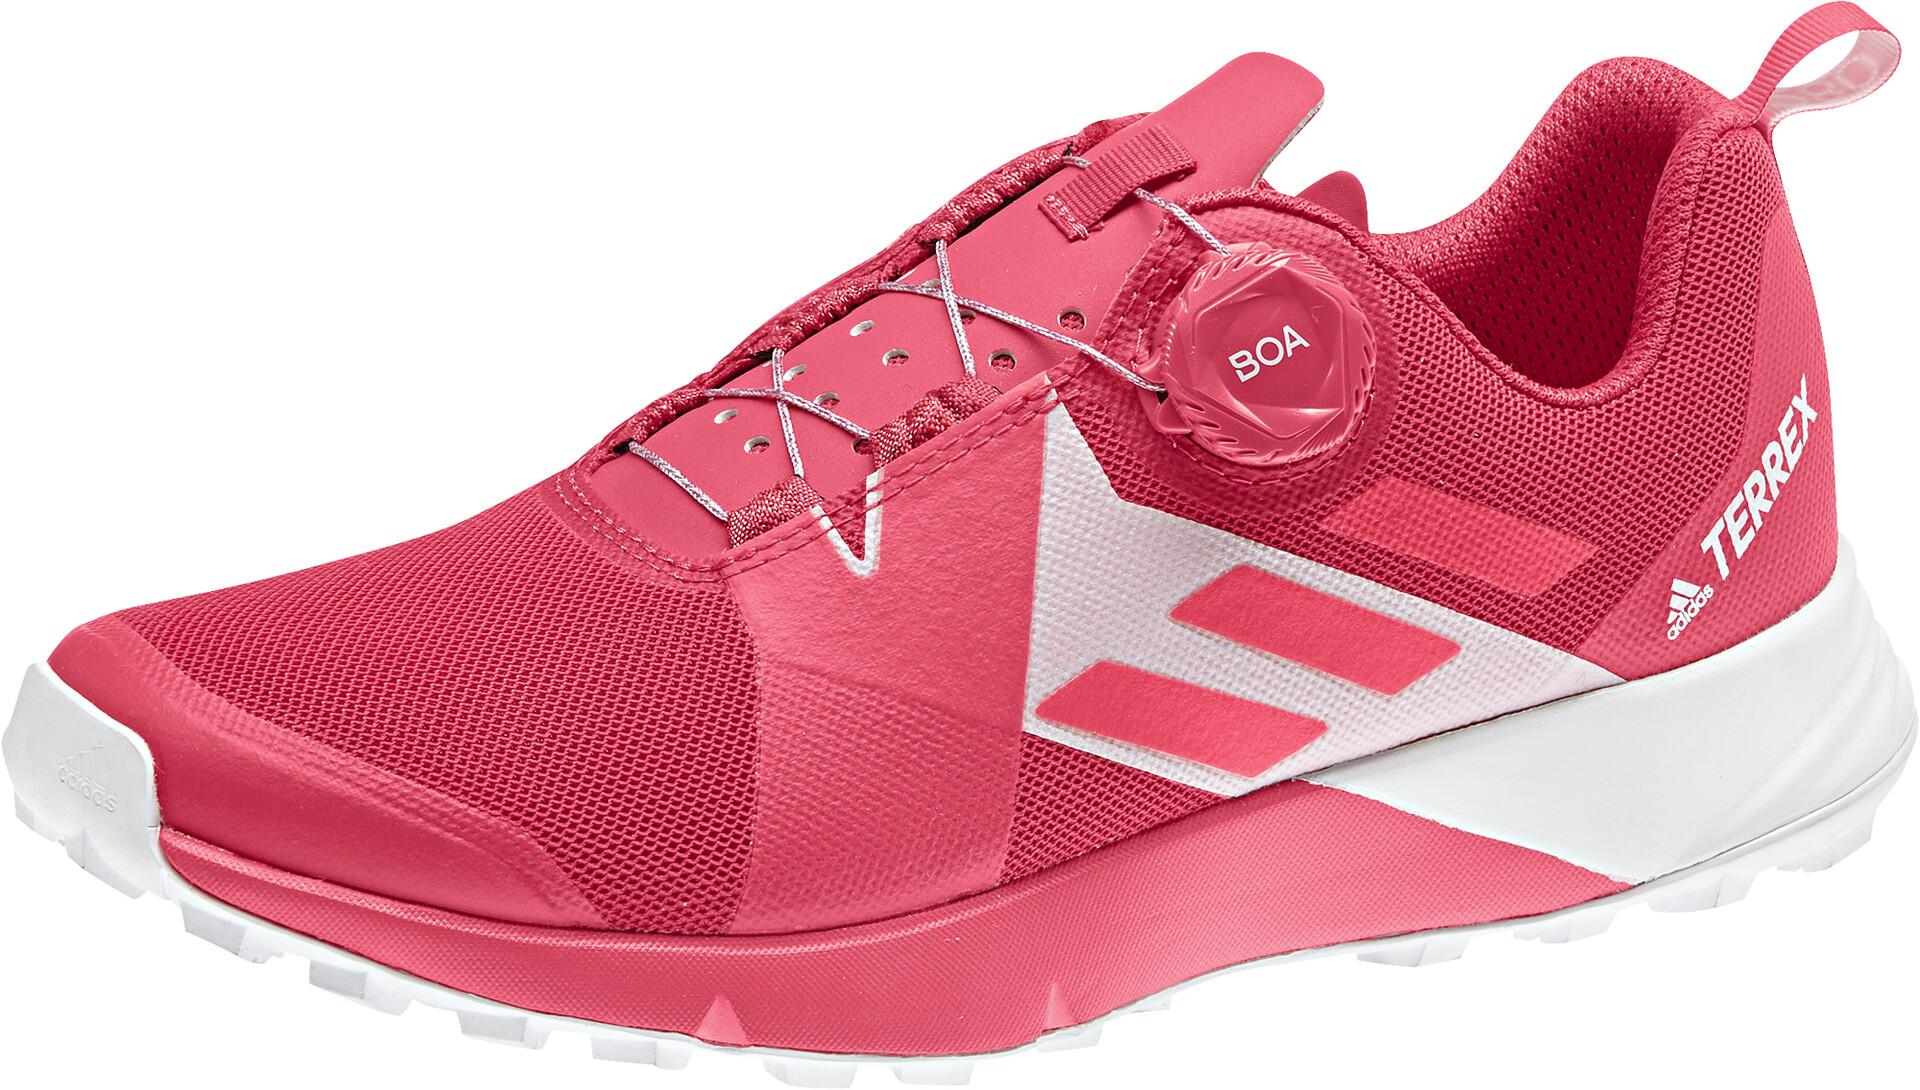 adidas TERREX Two Boa Sko Damer, active pinkshoredftwr white